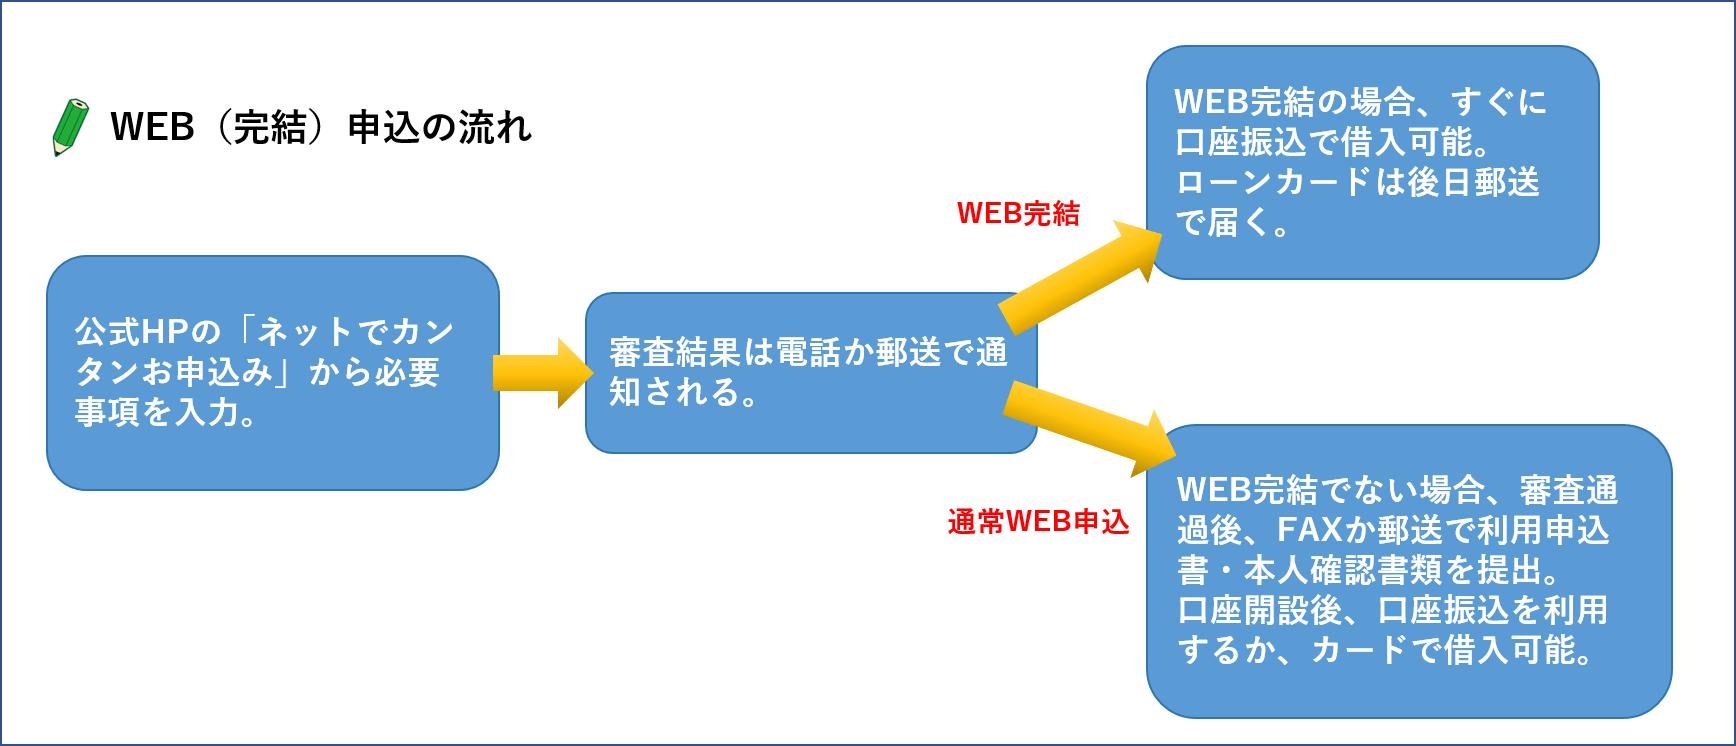 WEB完結 流れ